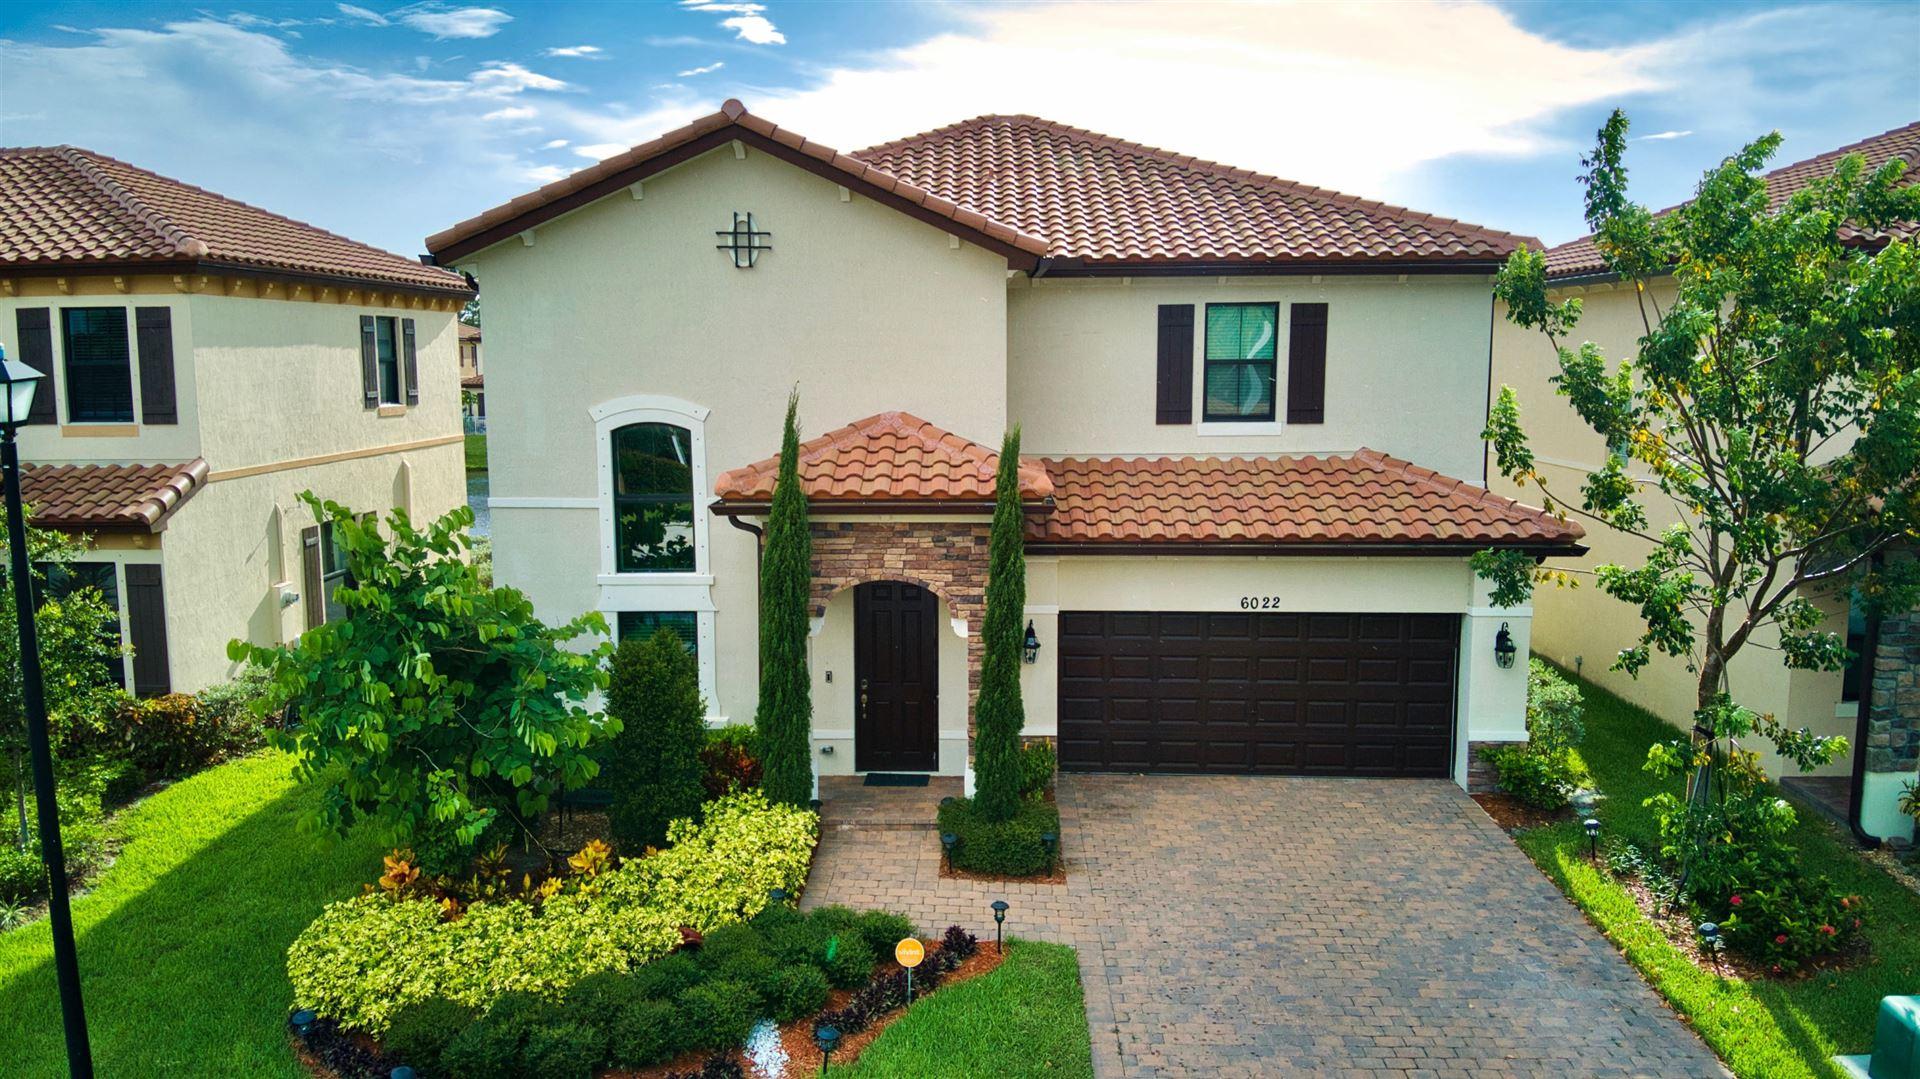 6022 Sandhill Crane Drive, Greenacres, FL 33415 - MLS#: RX-10634572